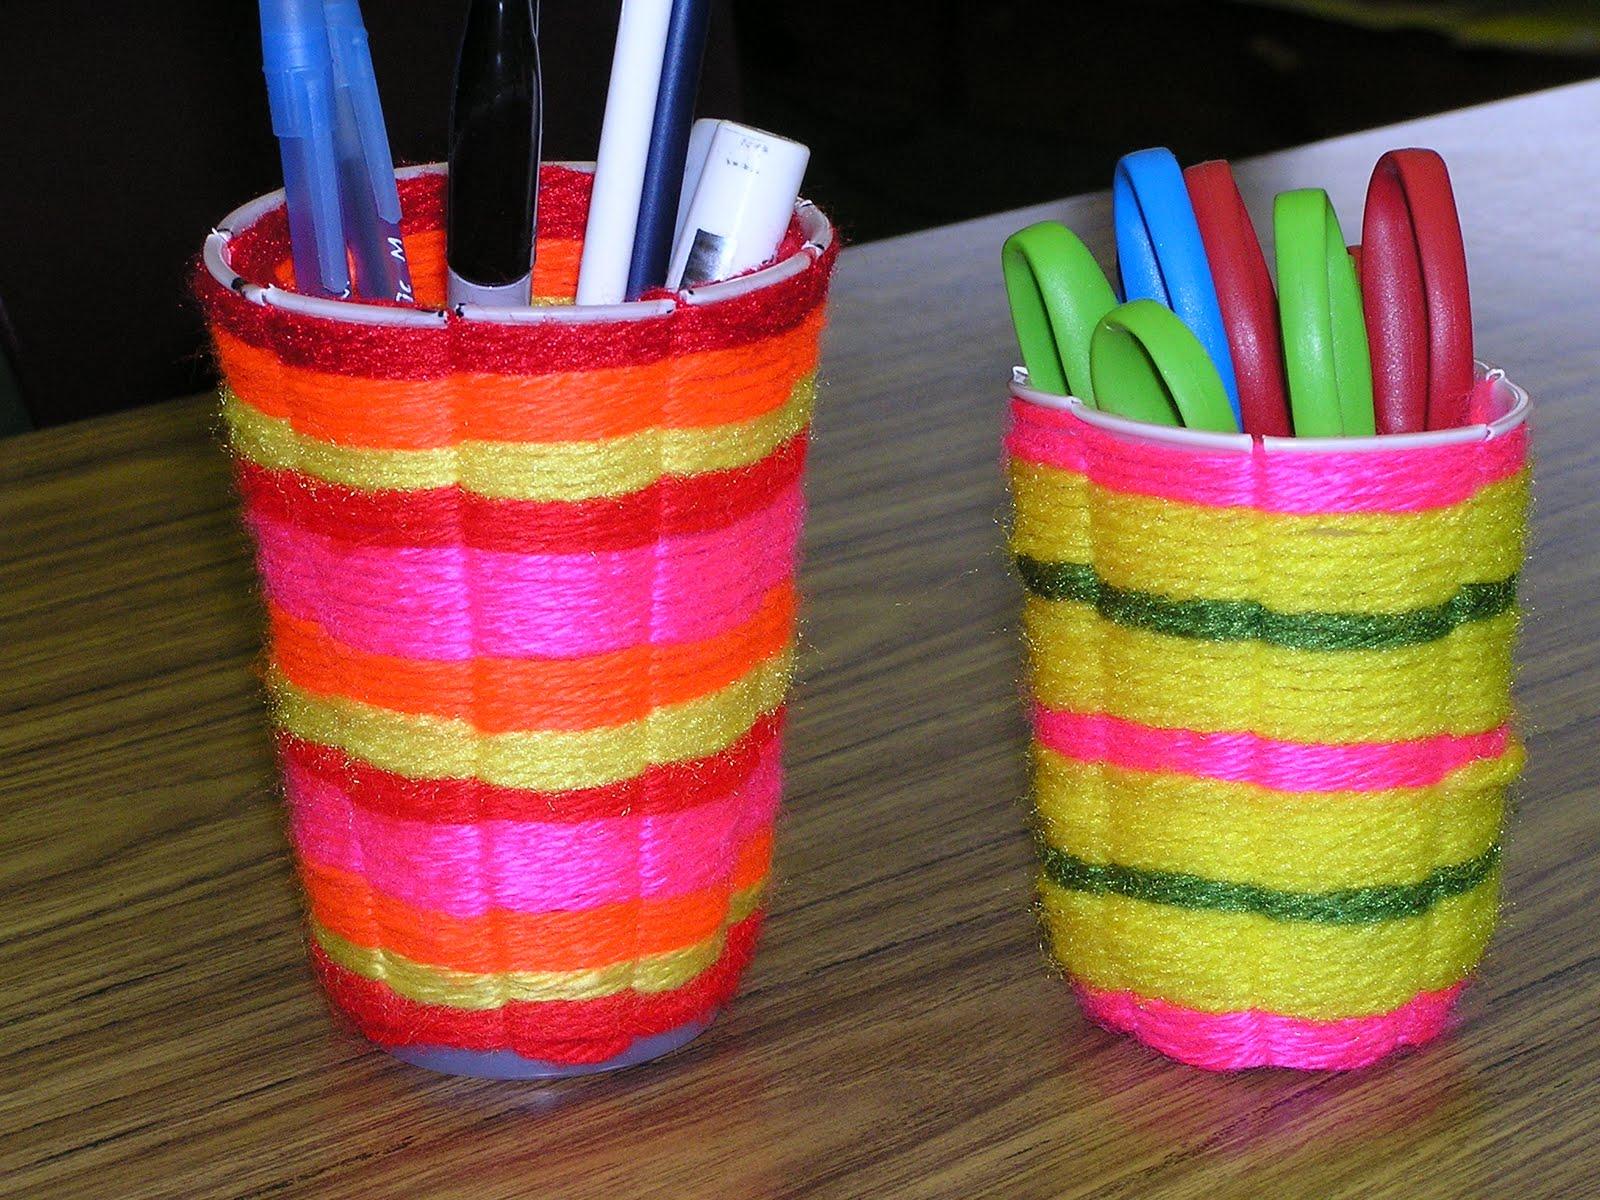 Basket Weaving For Elementary Students : B art z elementary cup weaving